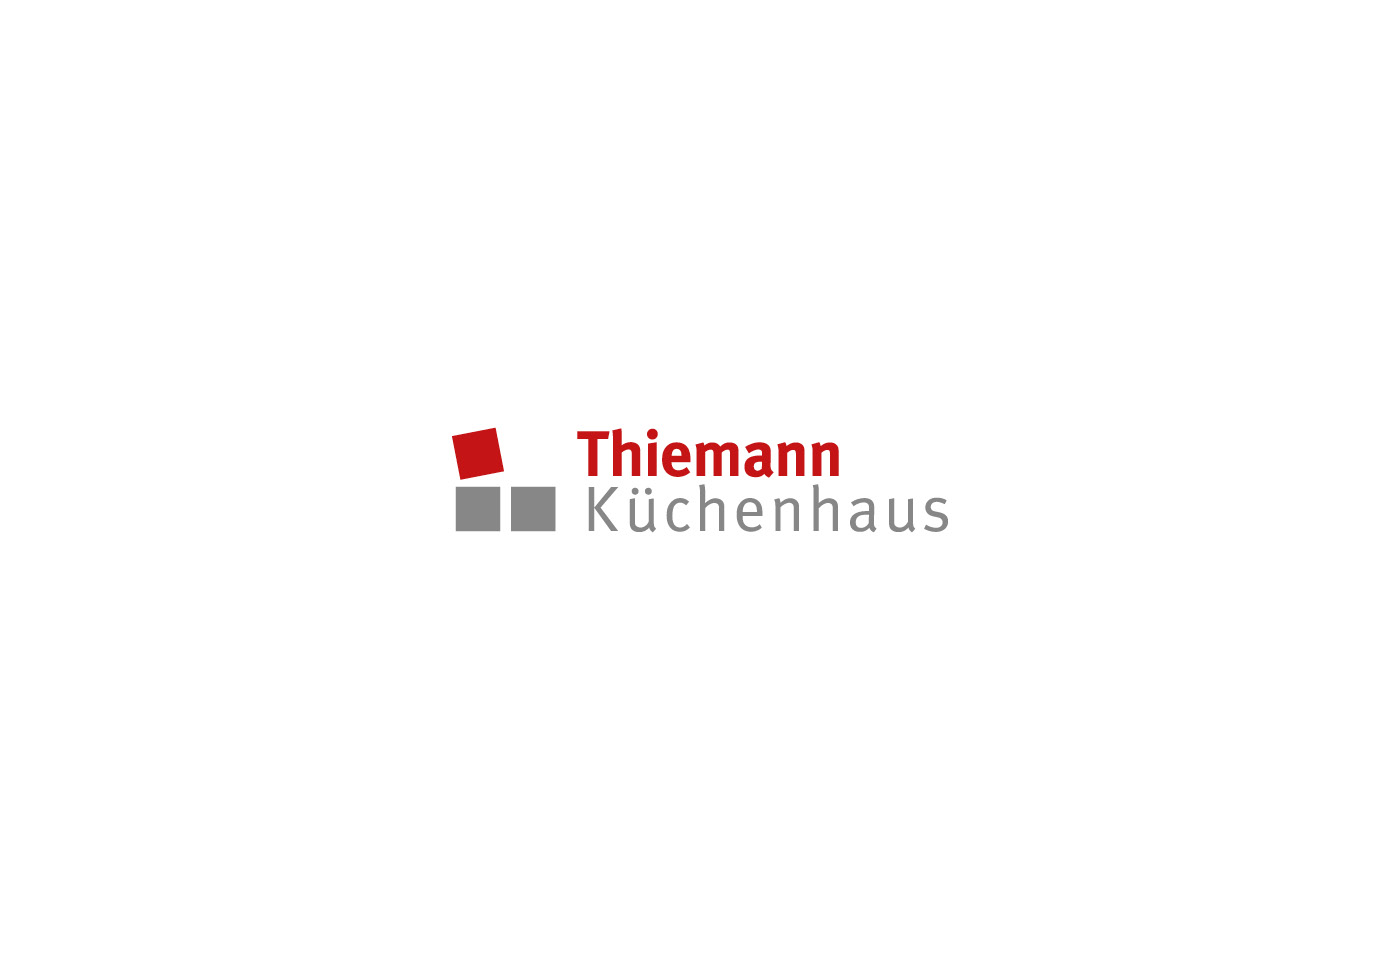 Küchenhaus Thiemann | THURM DESIGN | {Küchenhaus 12}